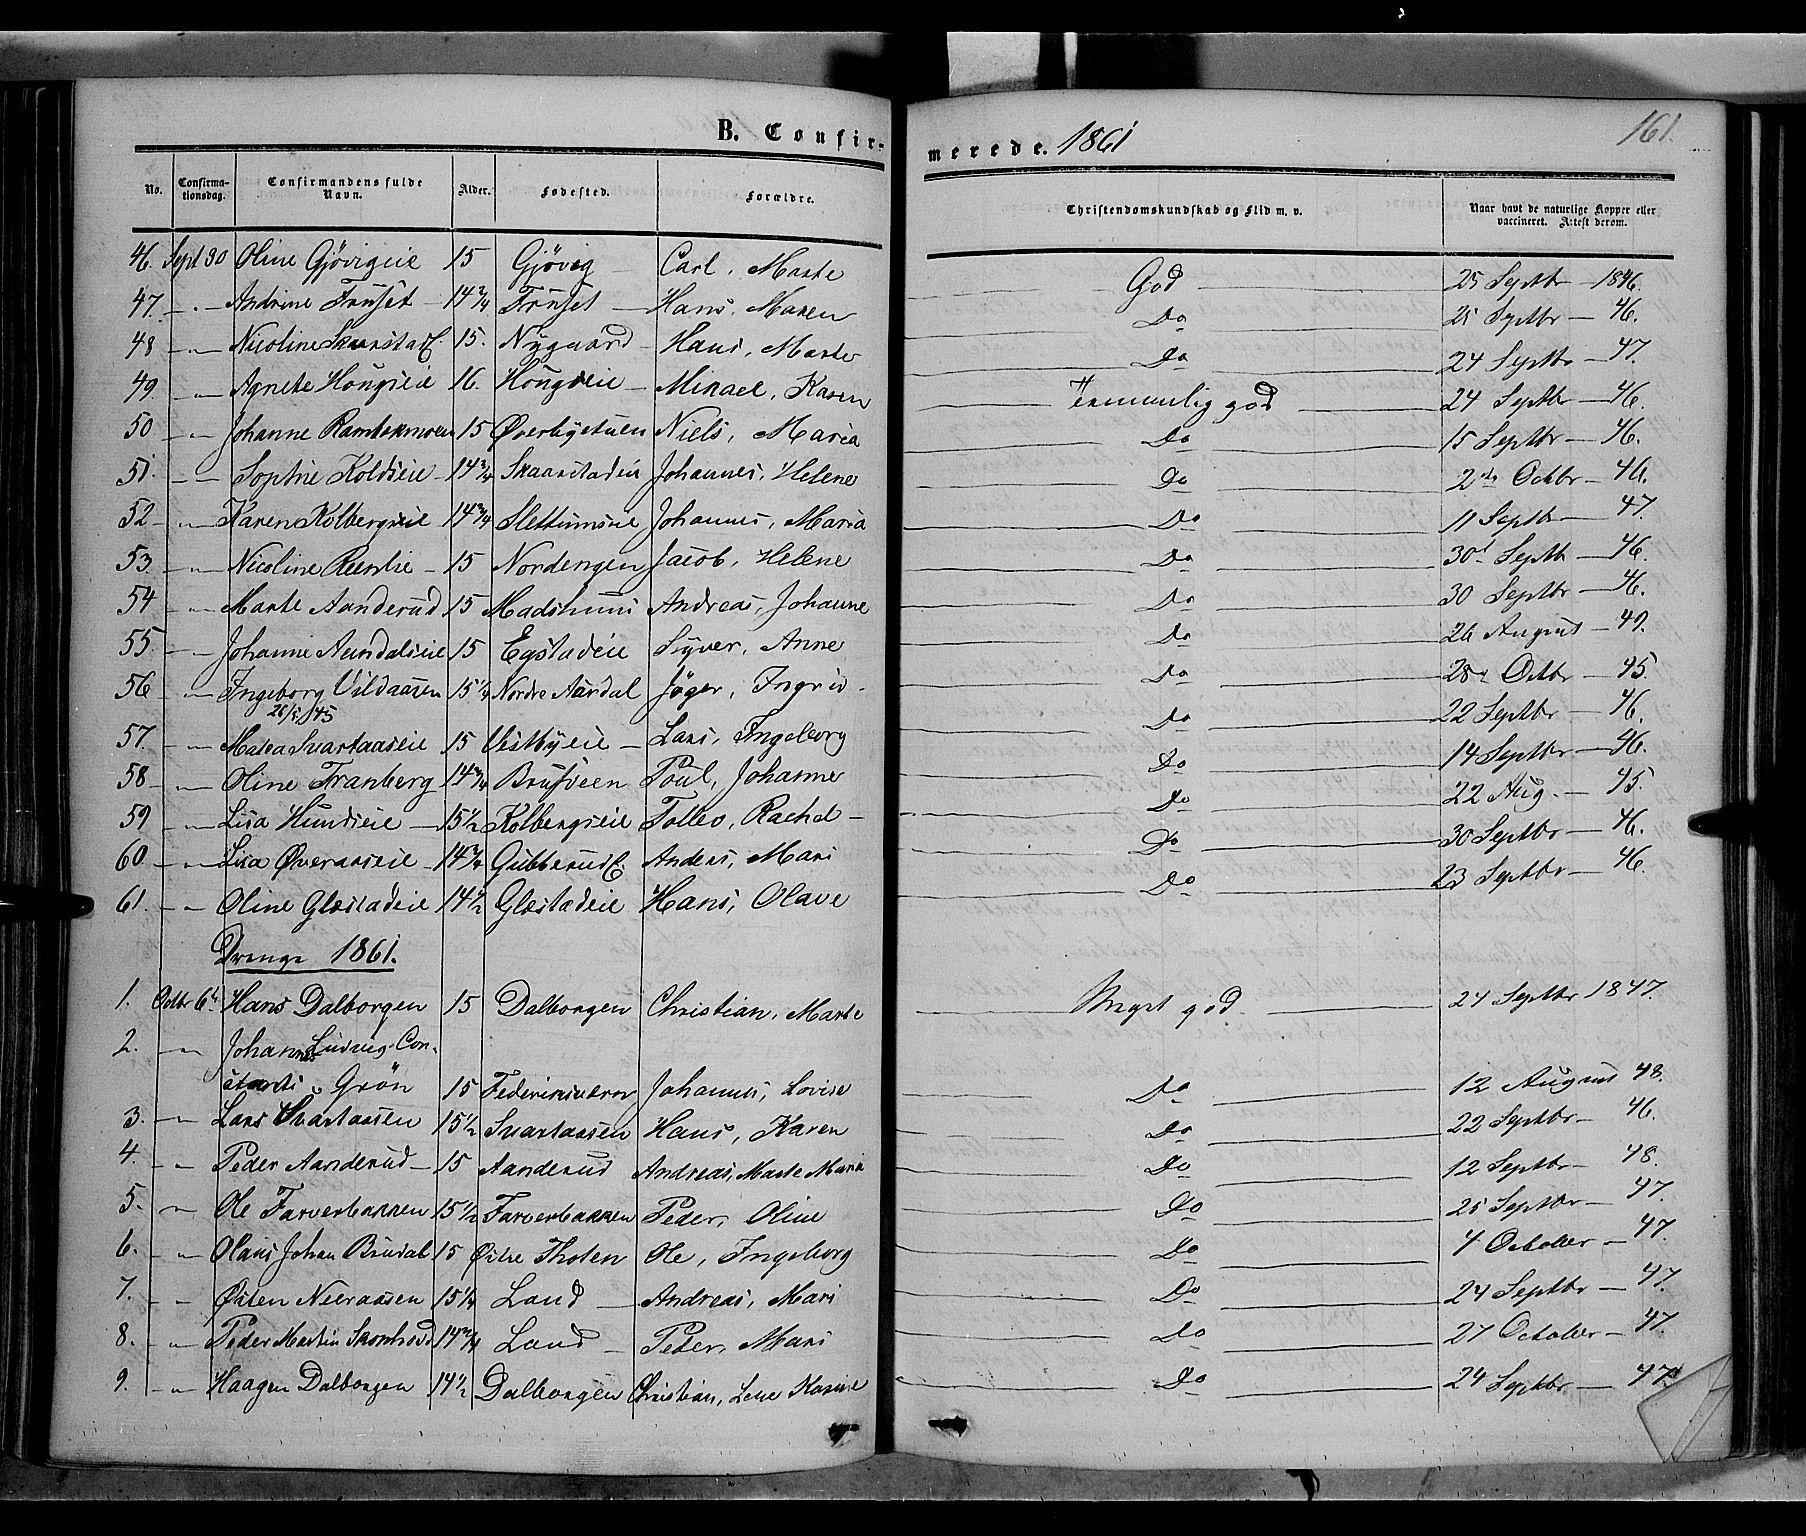 SAH, Vardal prestekontor, H/Ha/Haa/L0006: Ministerialbok nr. 6, 1854-1866, s. 161